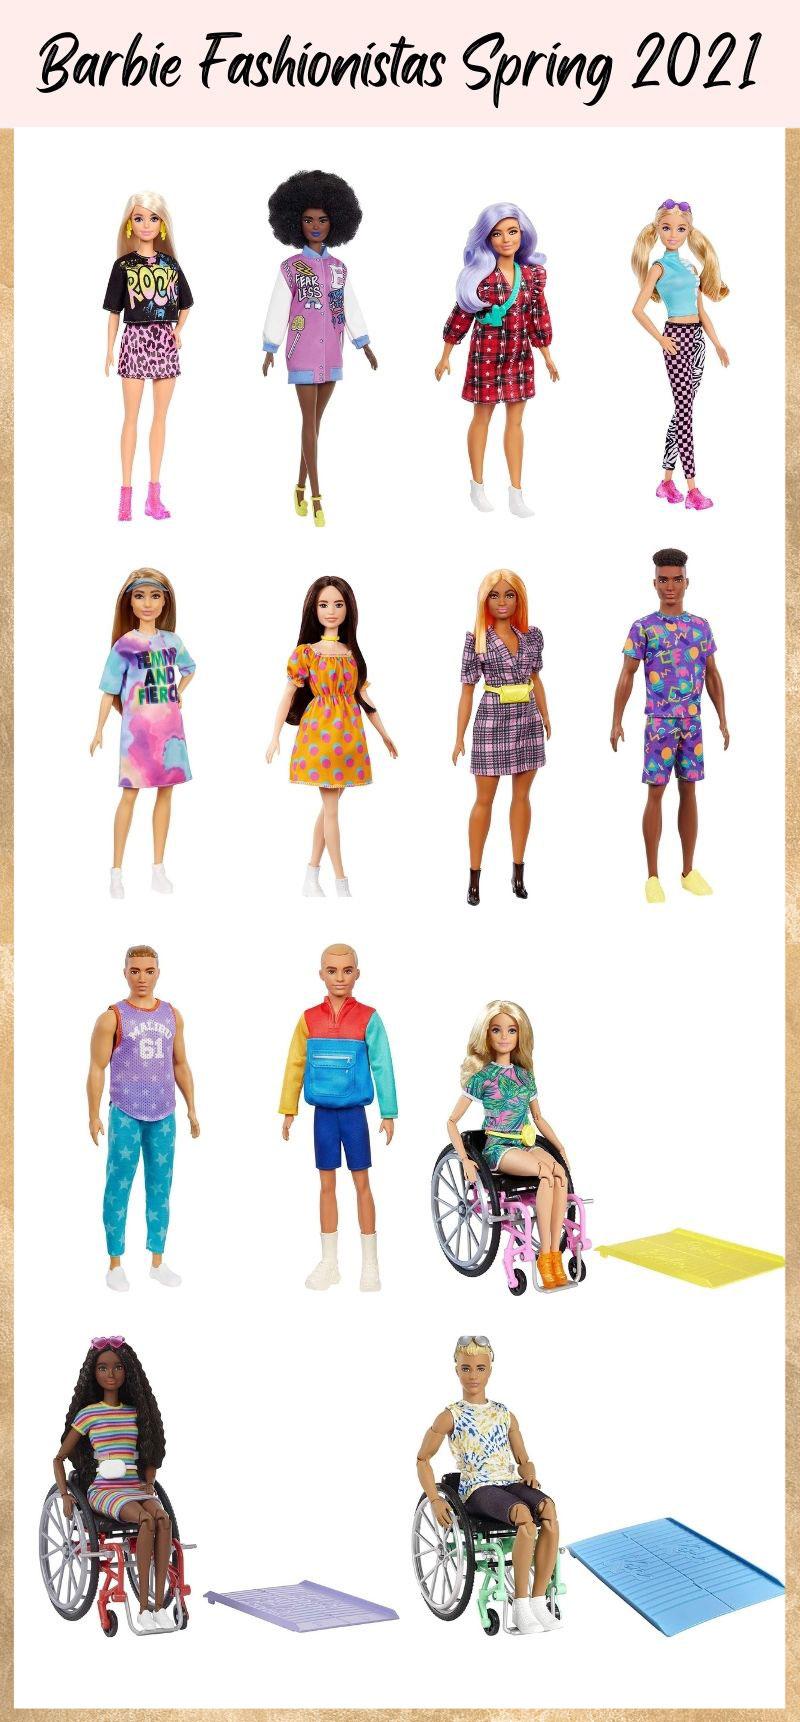 Spring 2021 Barbie Fashionistas.